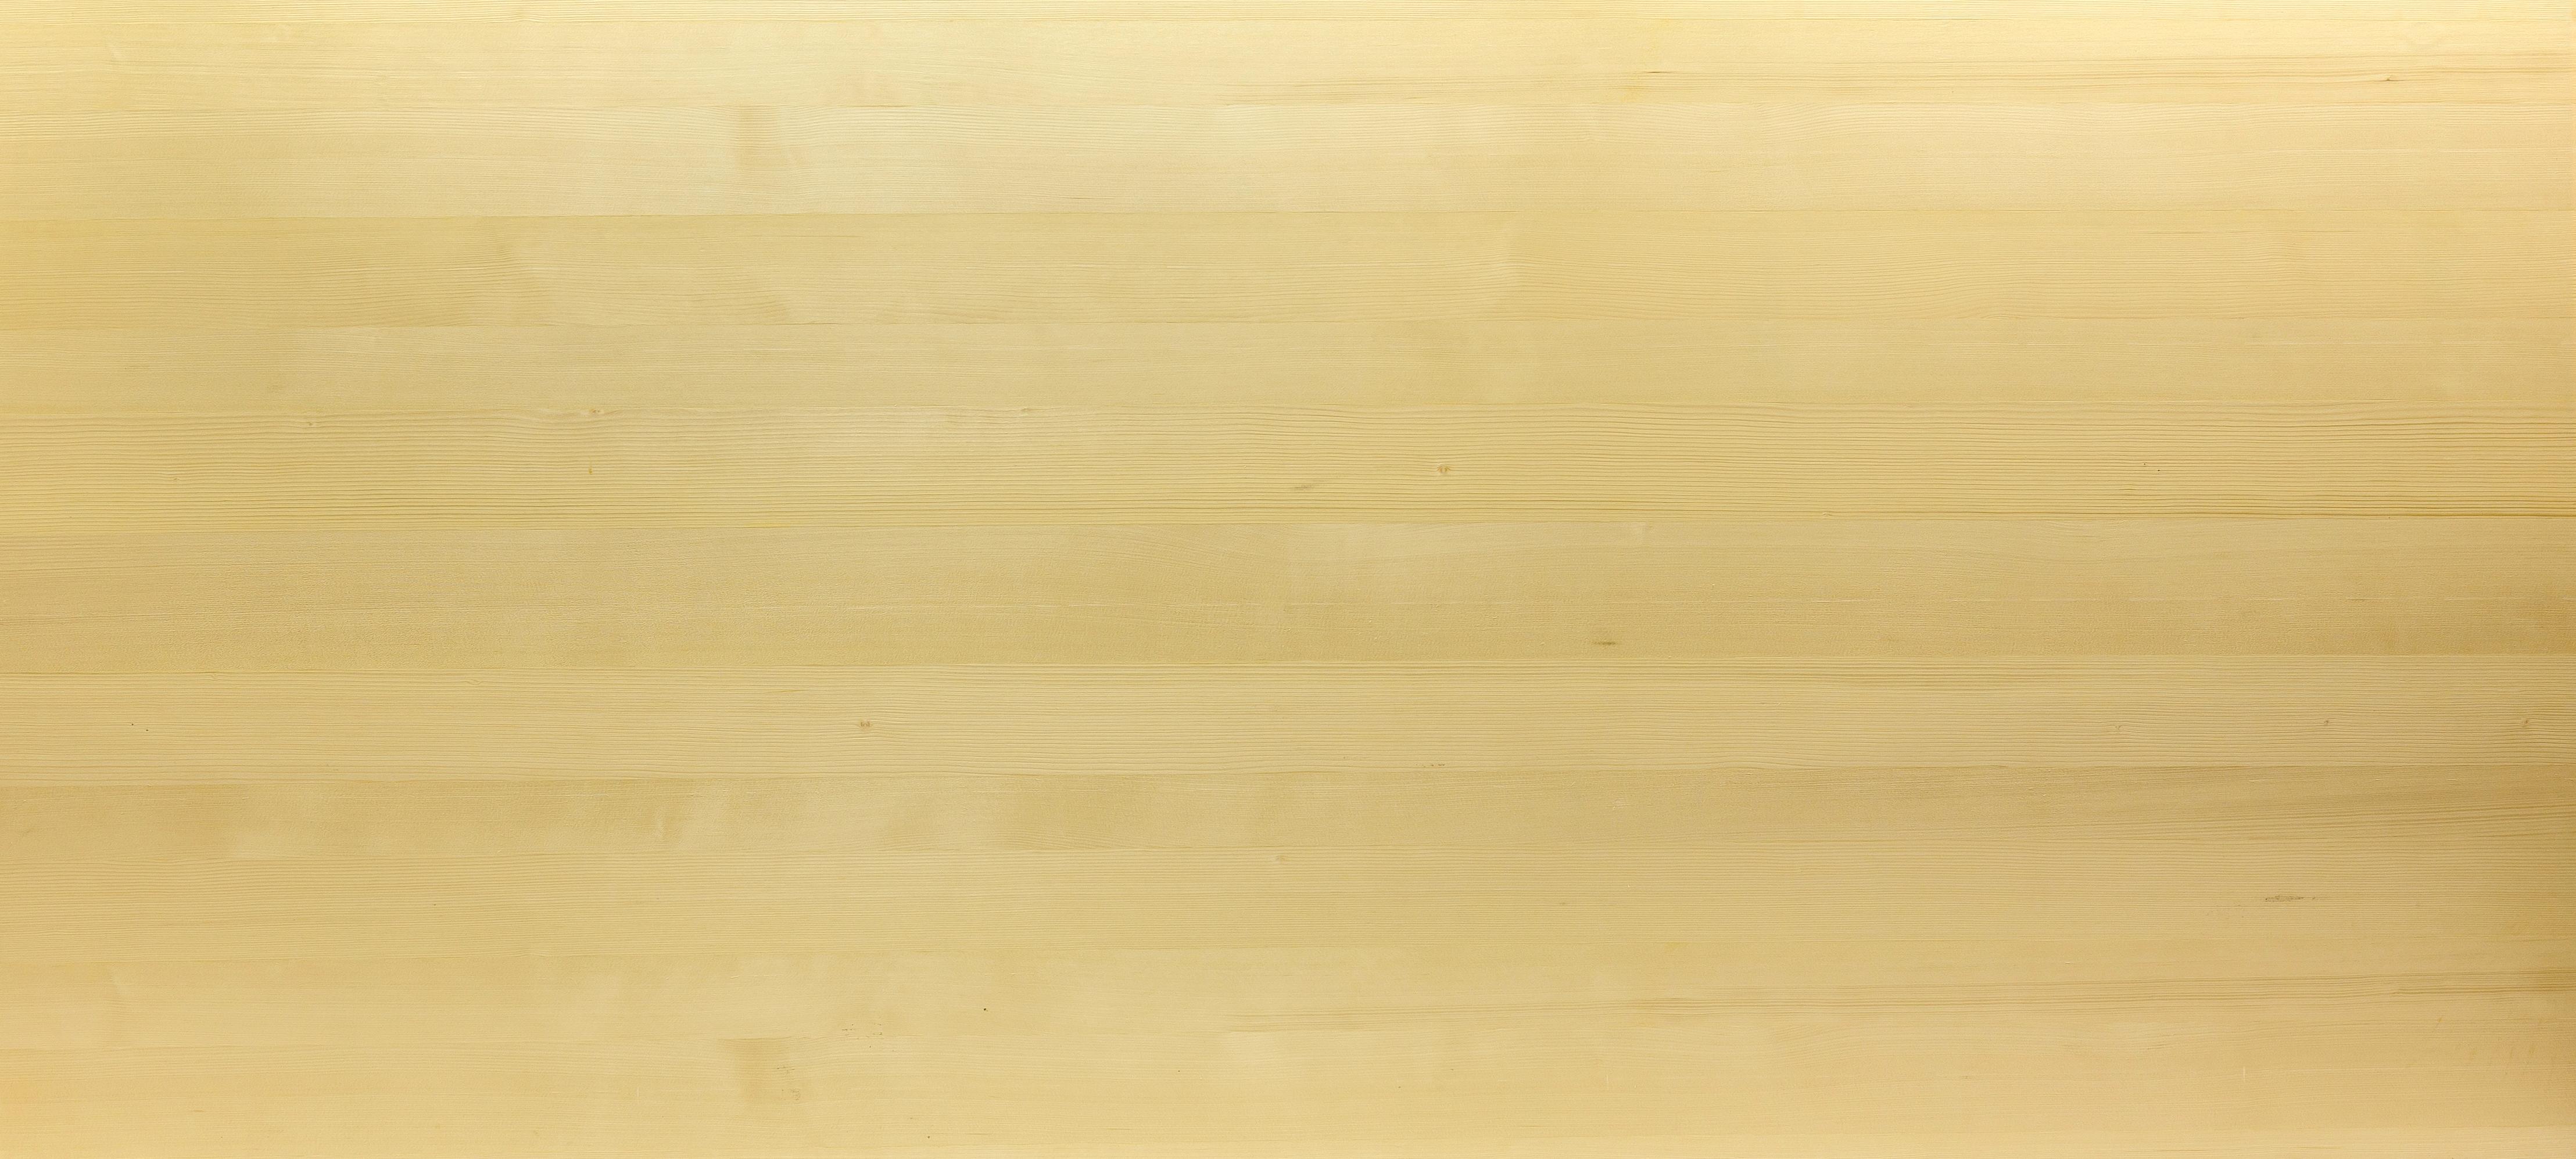 SB Fichte astfrei_spruce knot-free_6L1C9757_RGB